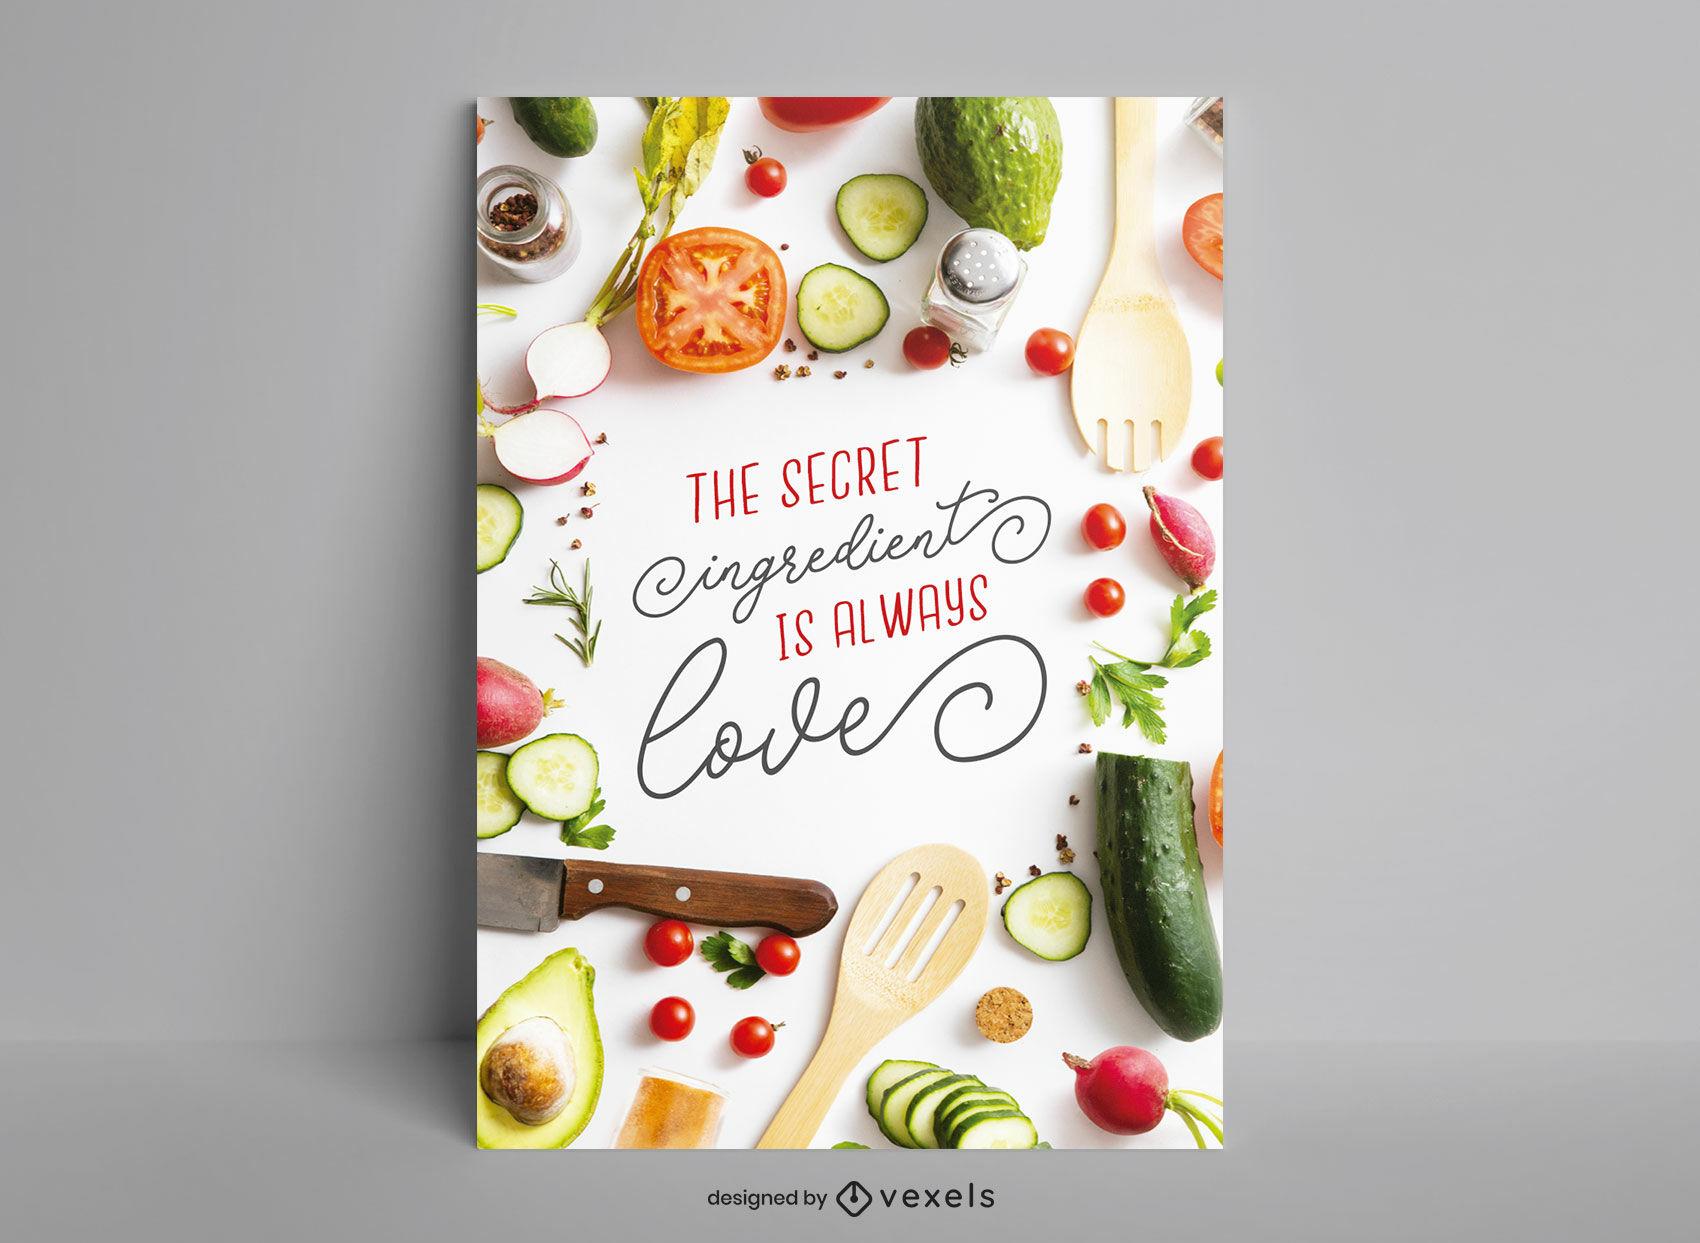 Healthy food ingredients poster design